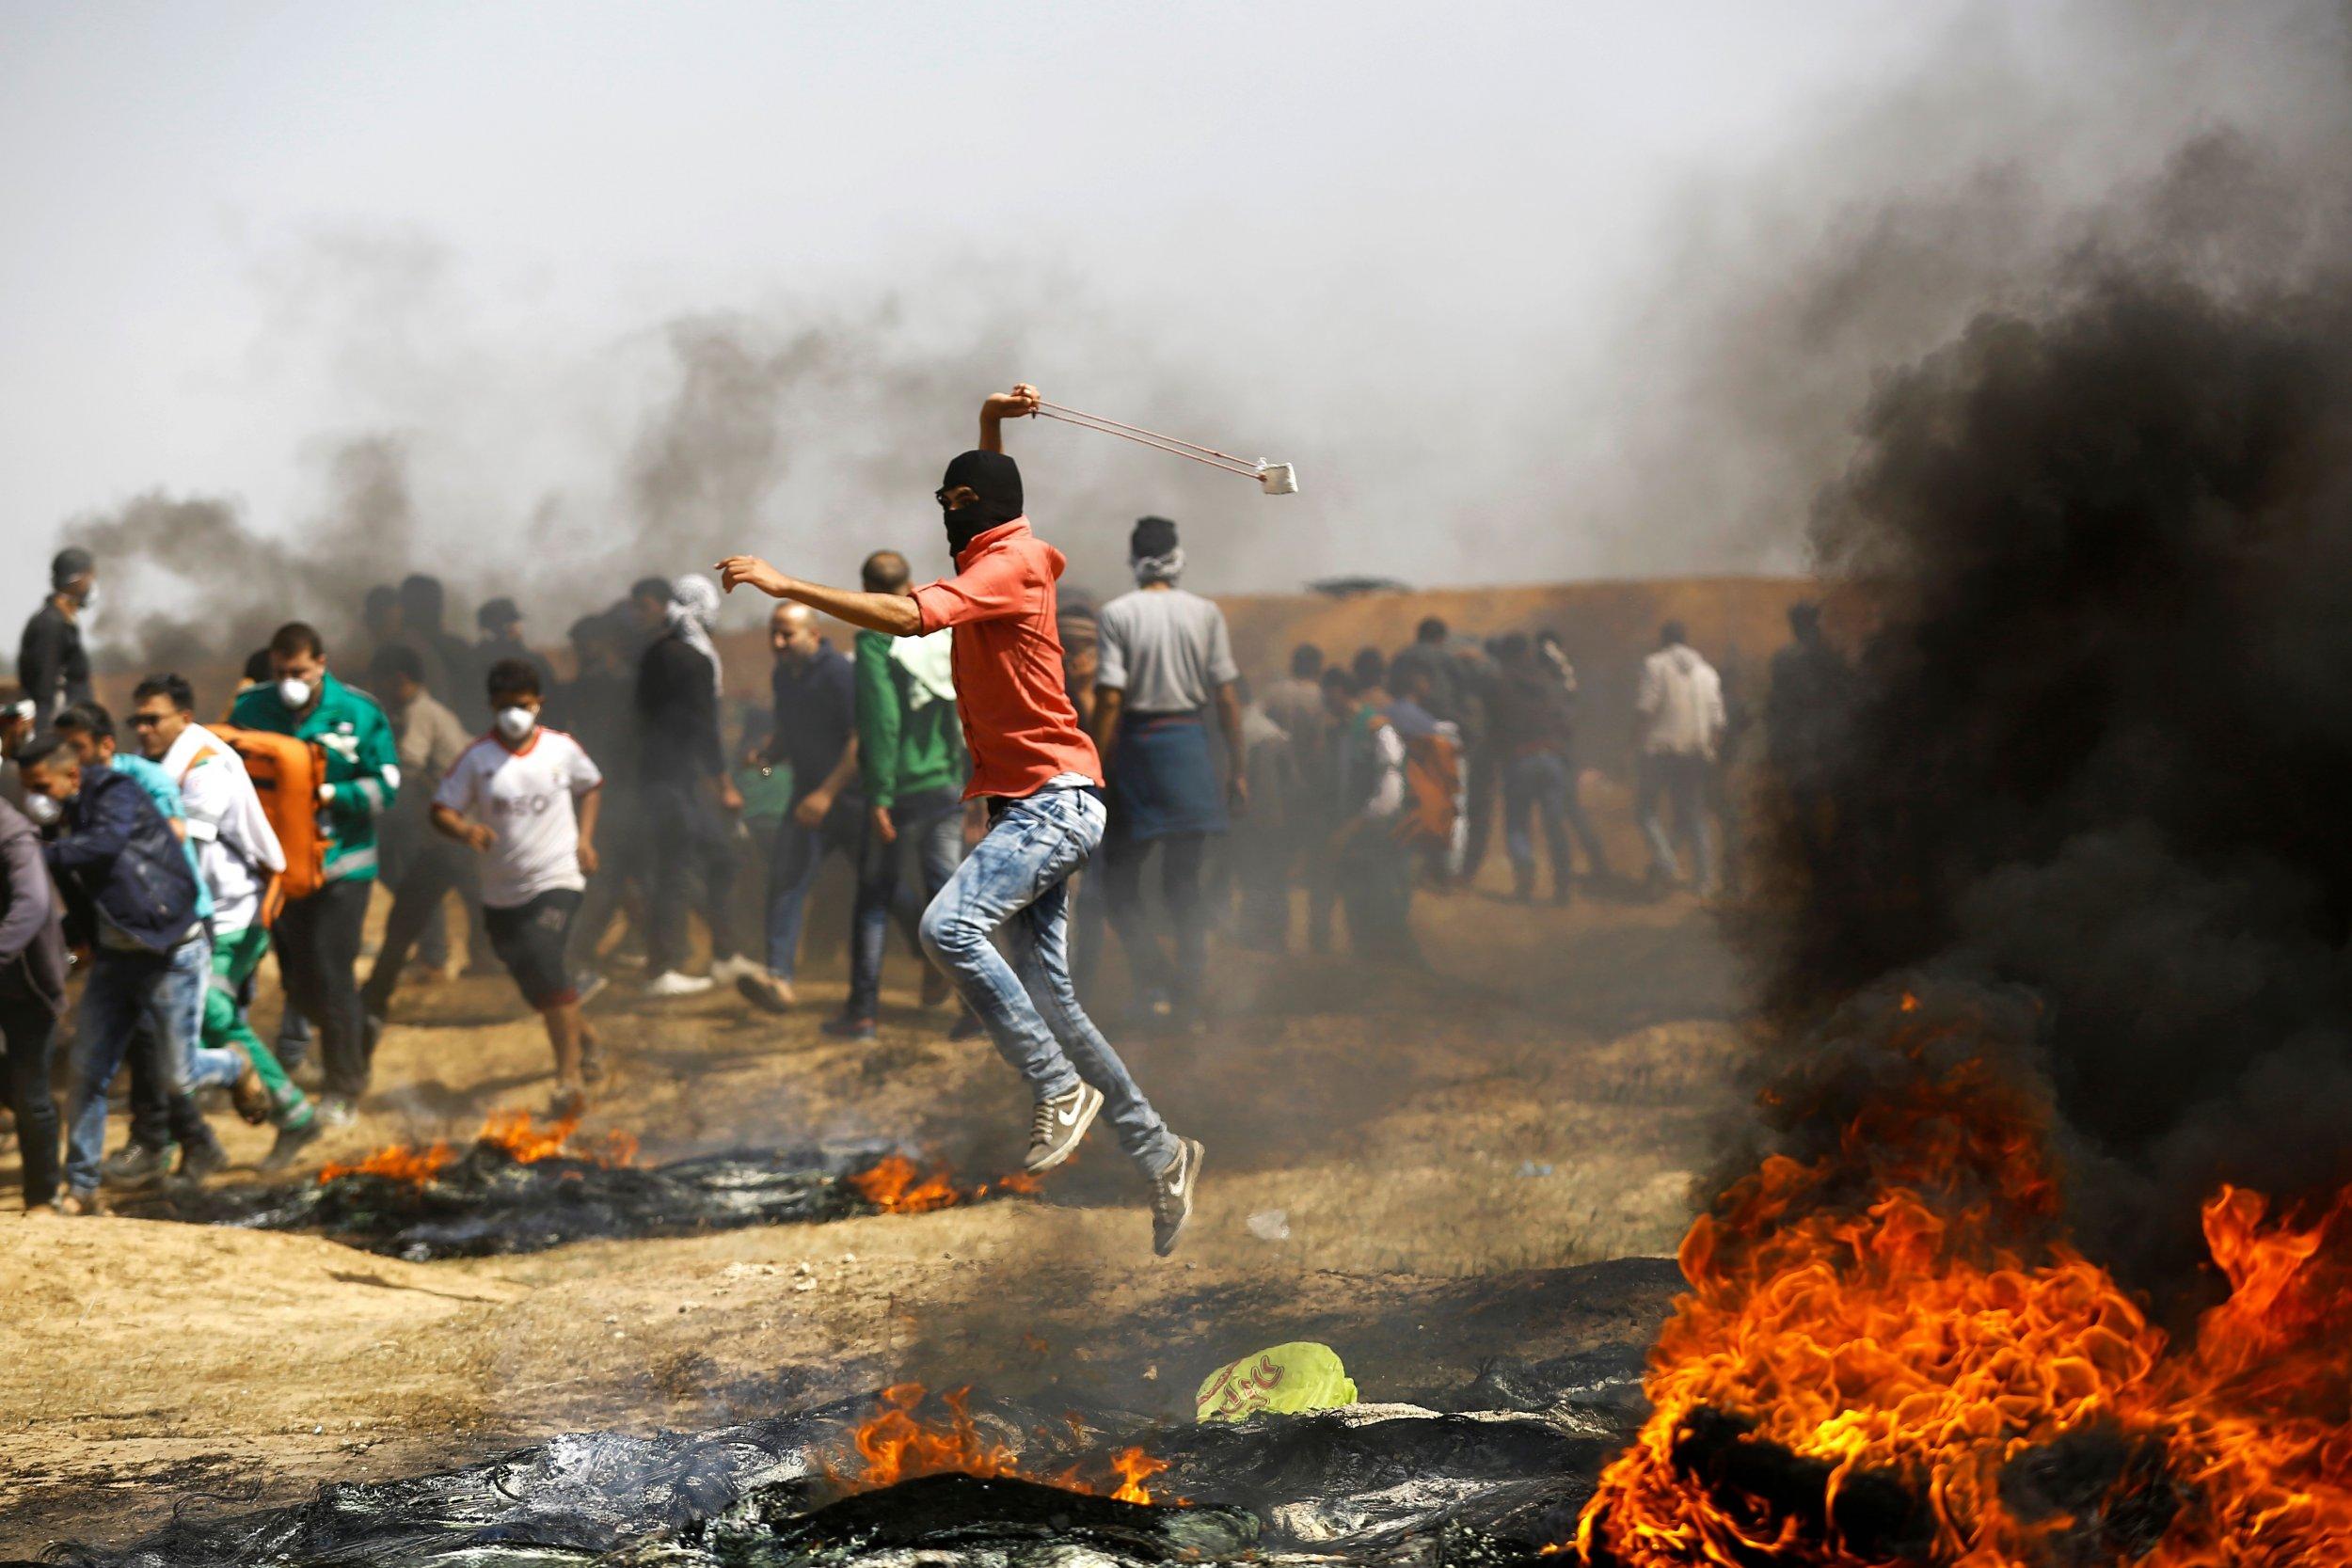 Trump's Israel Advisor Says U.S. Will Help Gaza When Hamas Renounces Violence